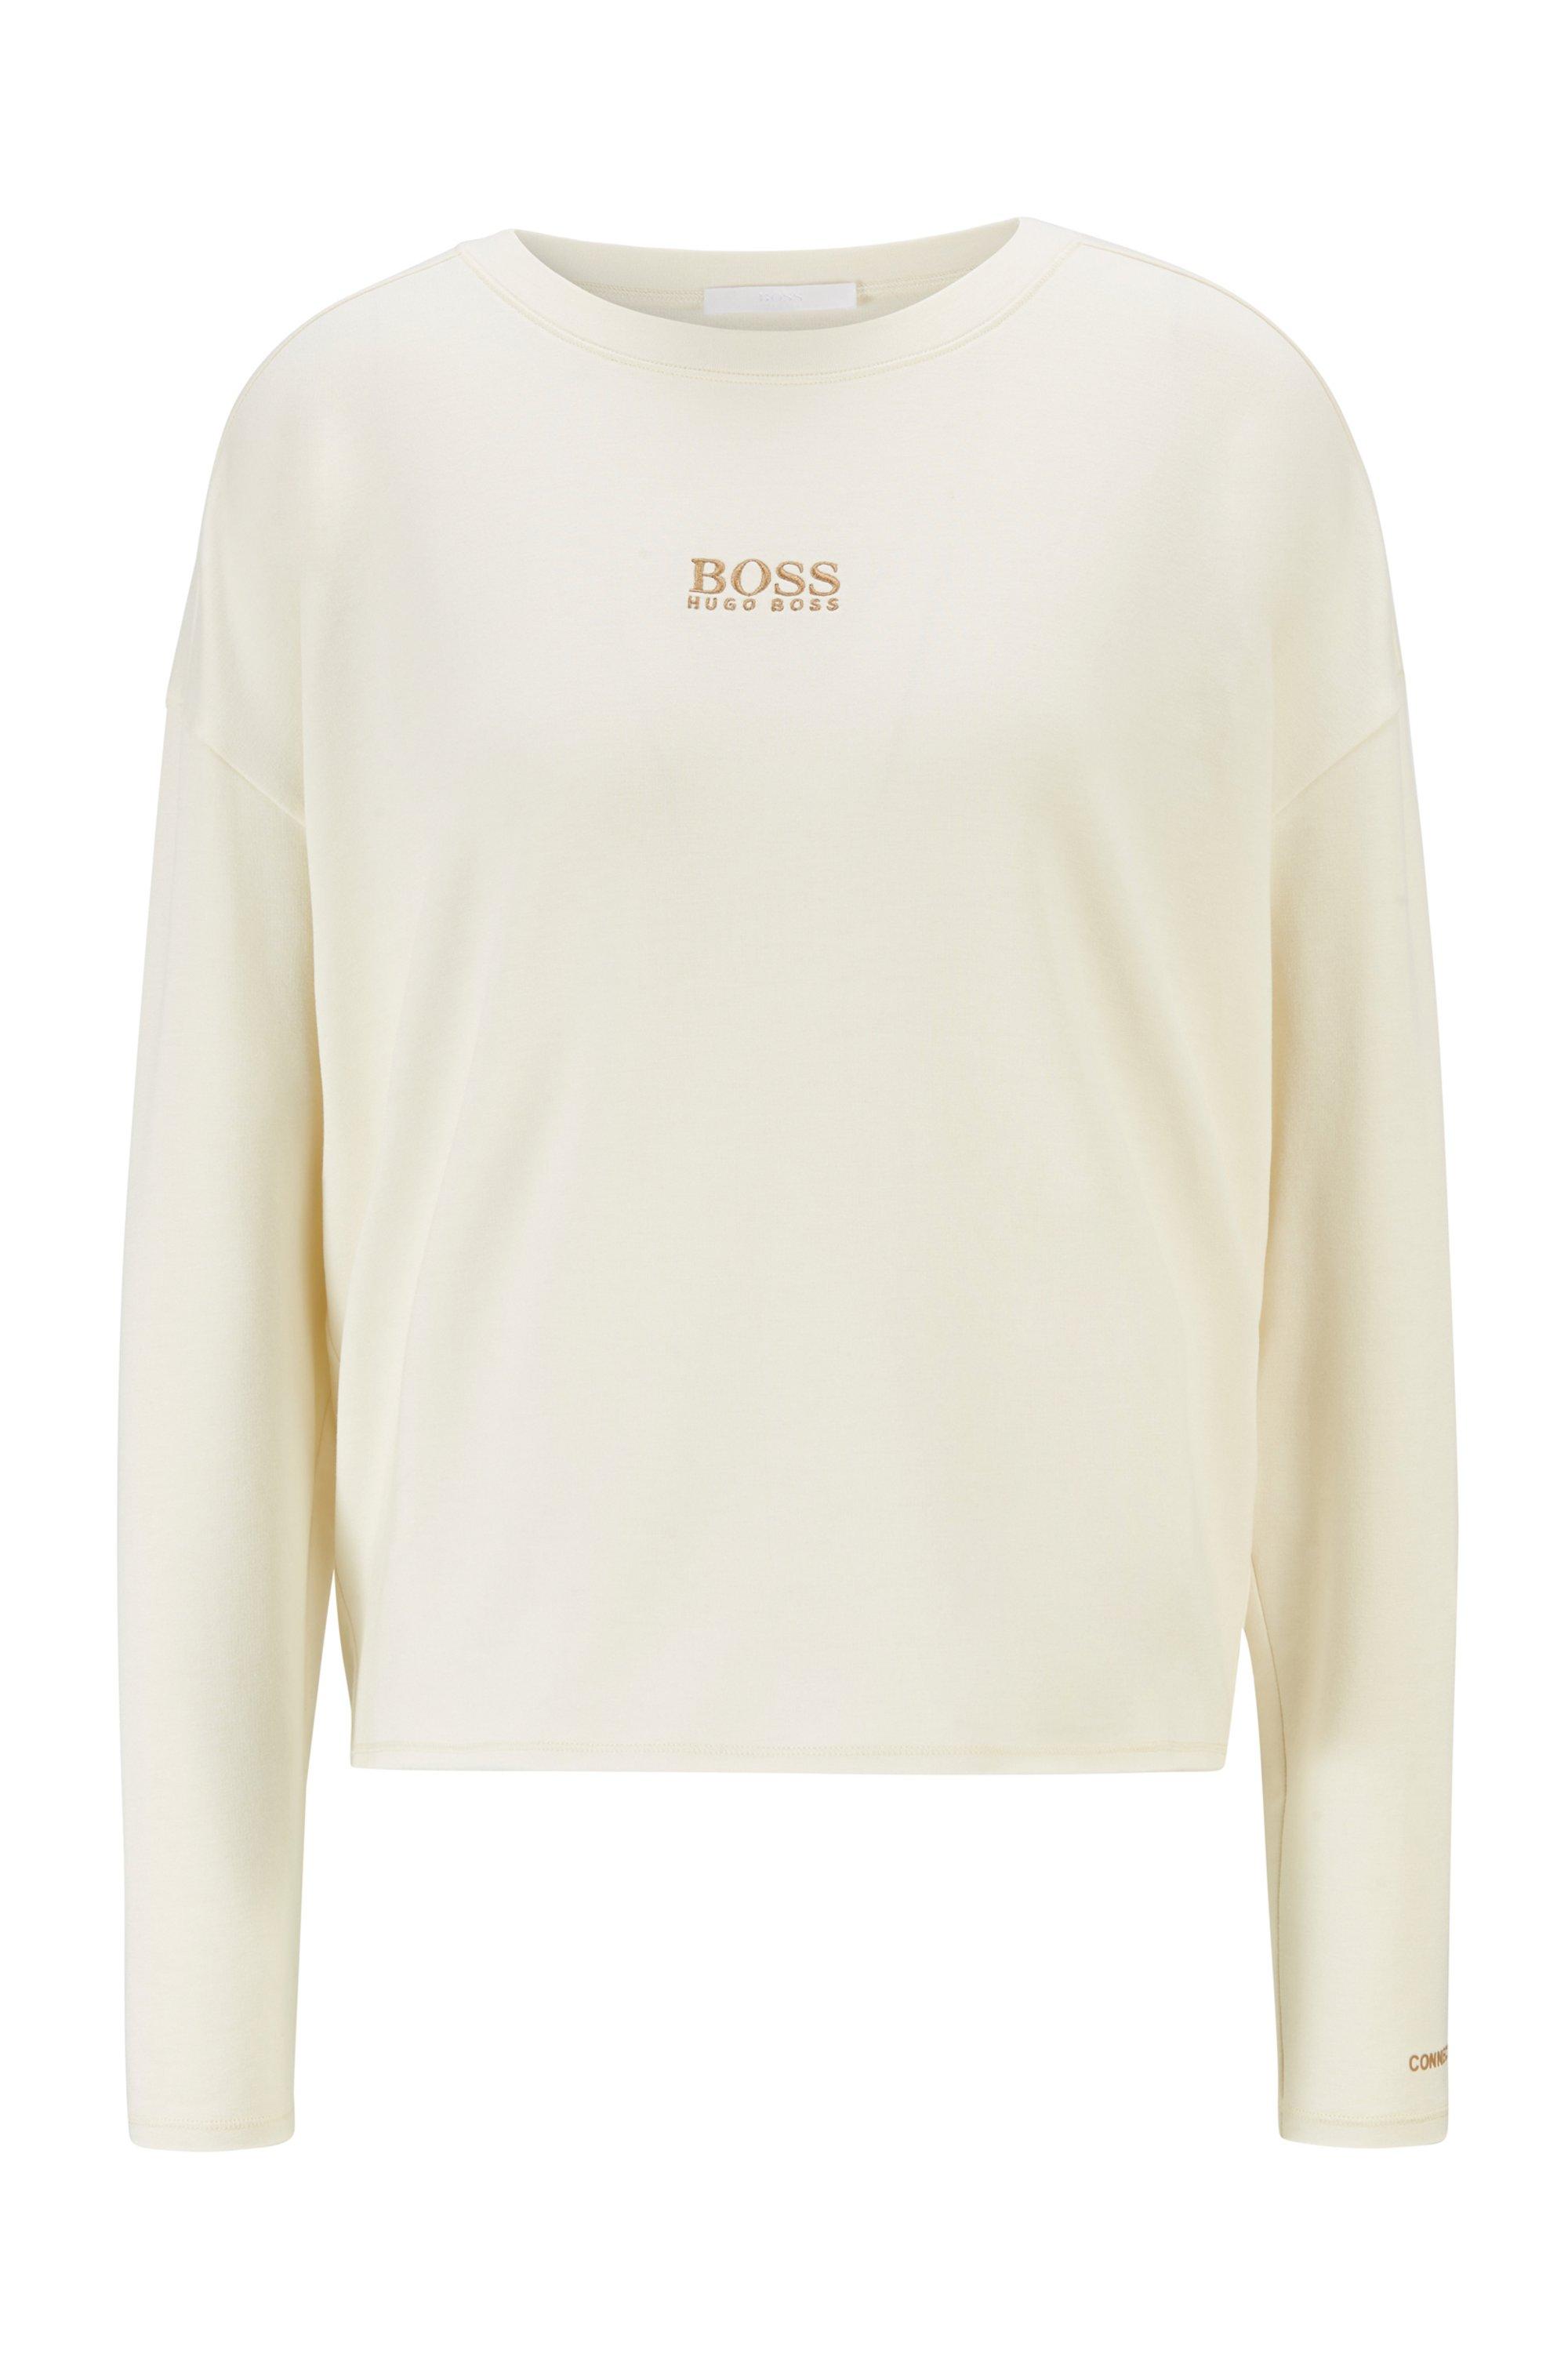 Sweat Relaxed Fit en molleton léger avec logo, Blanc